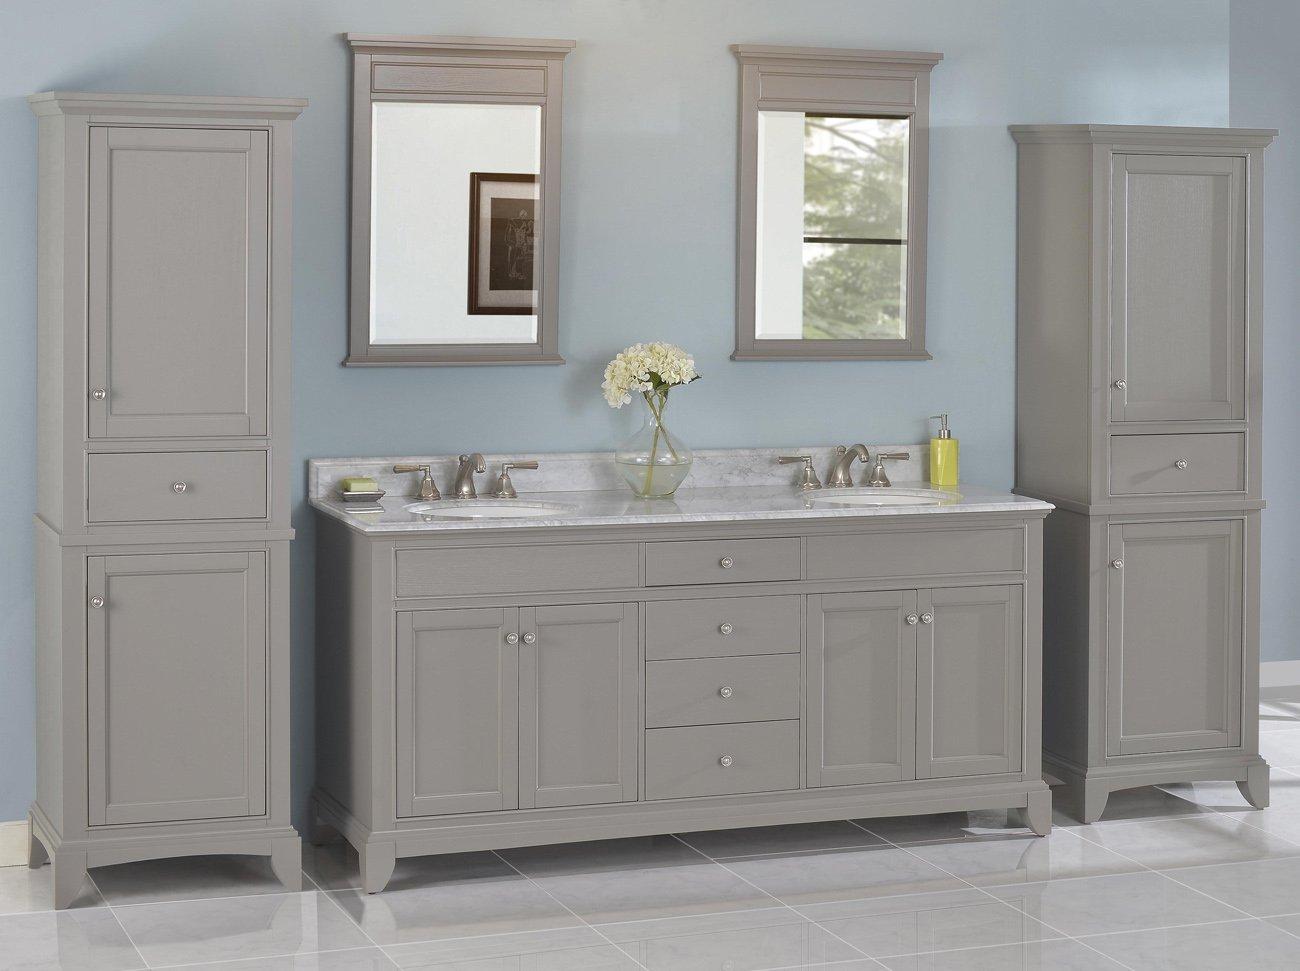 Fairmont Designs 1504-V7221D Smithfield 72